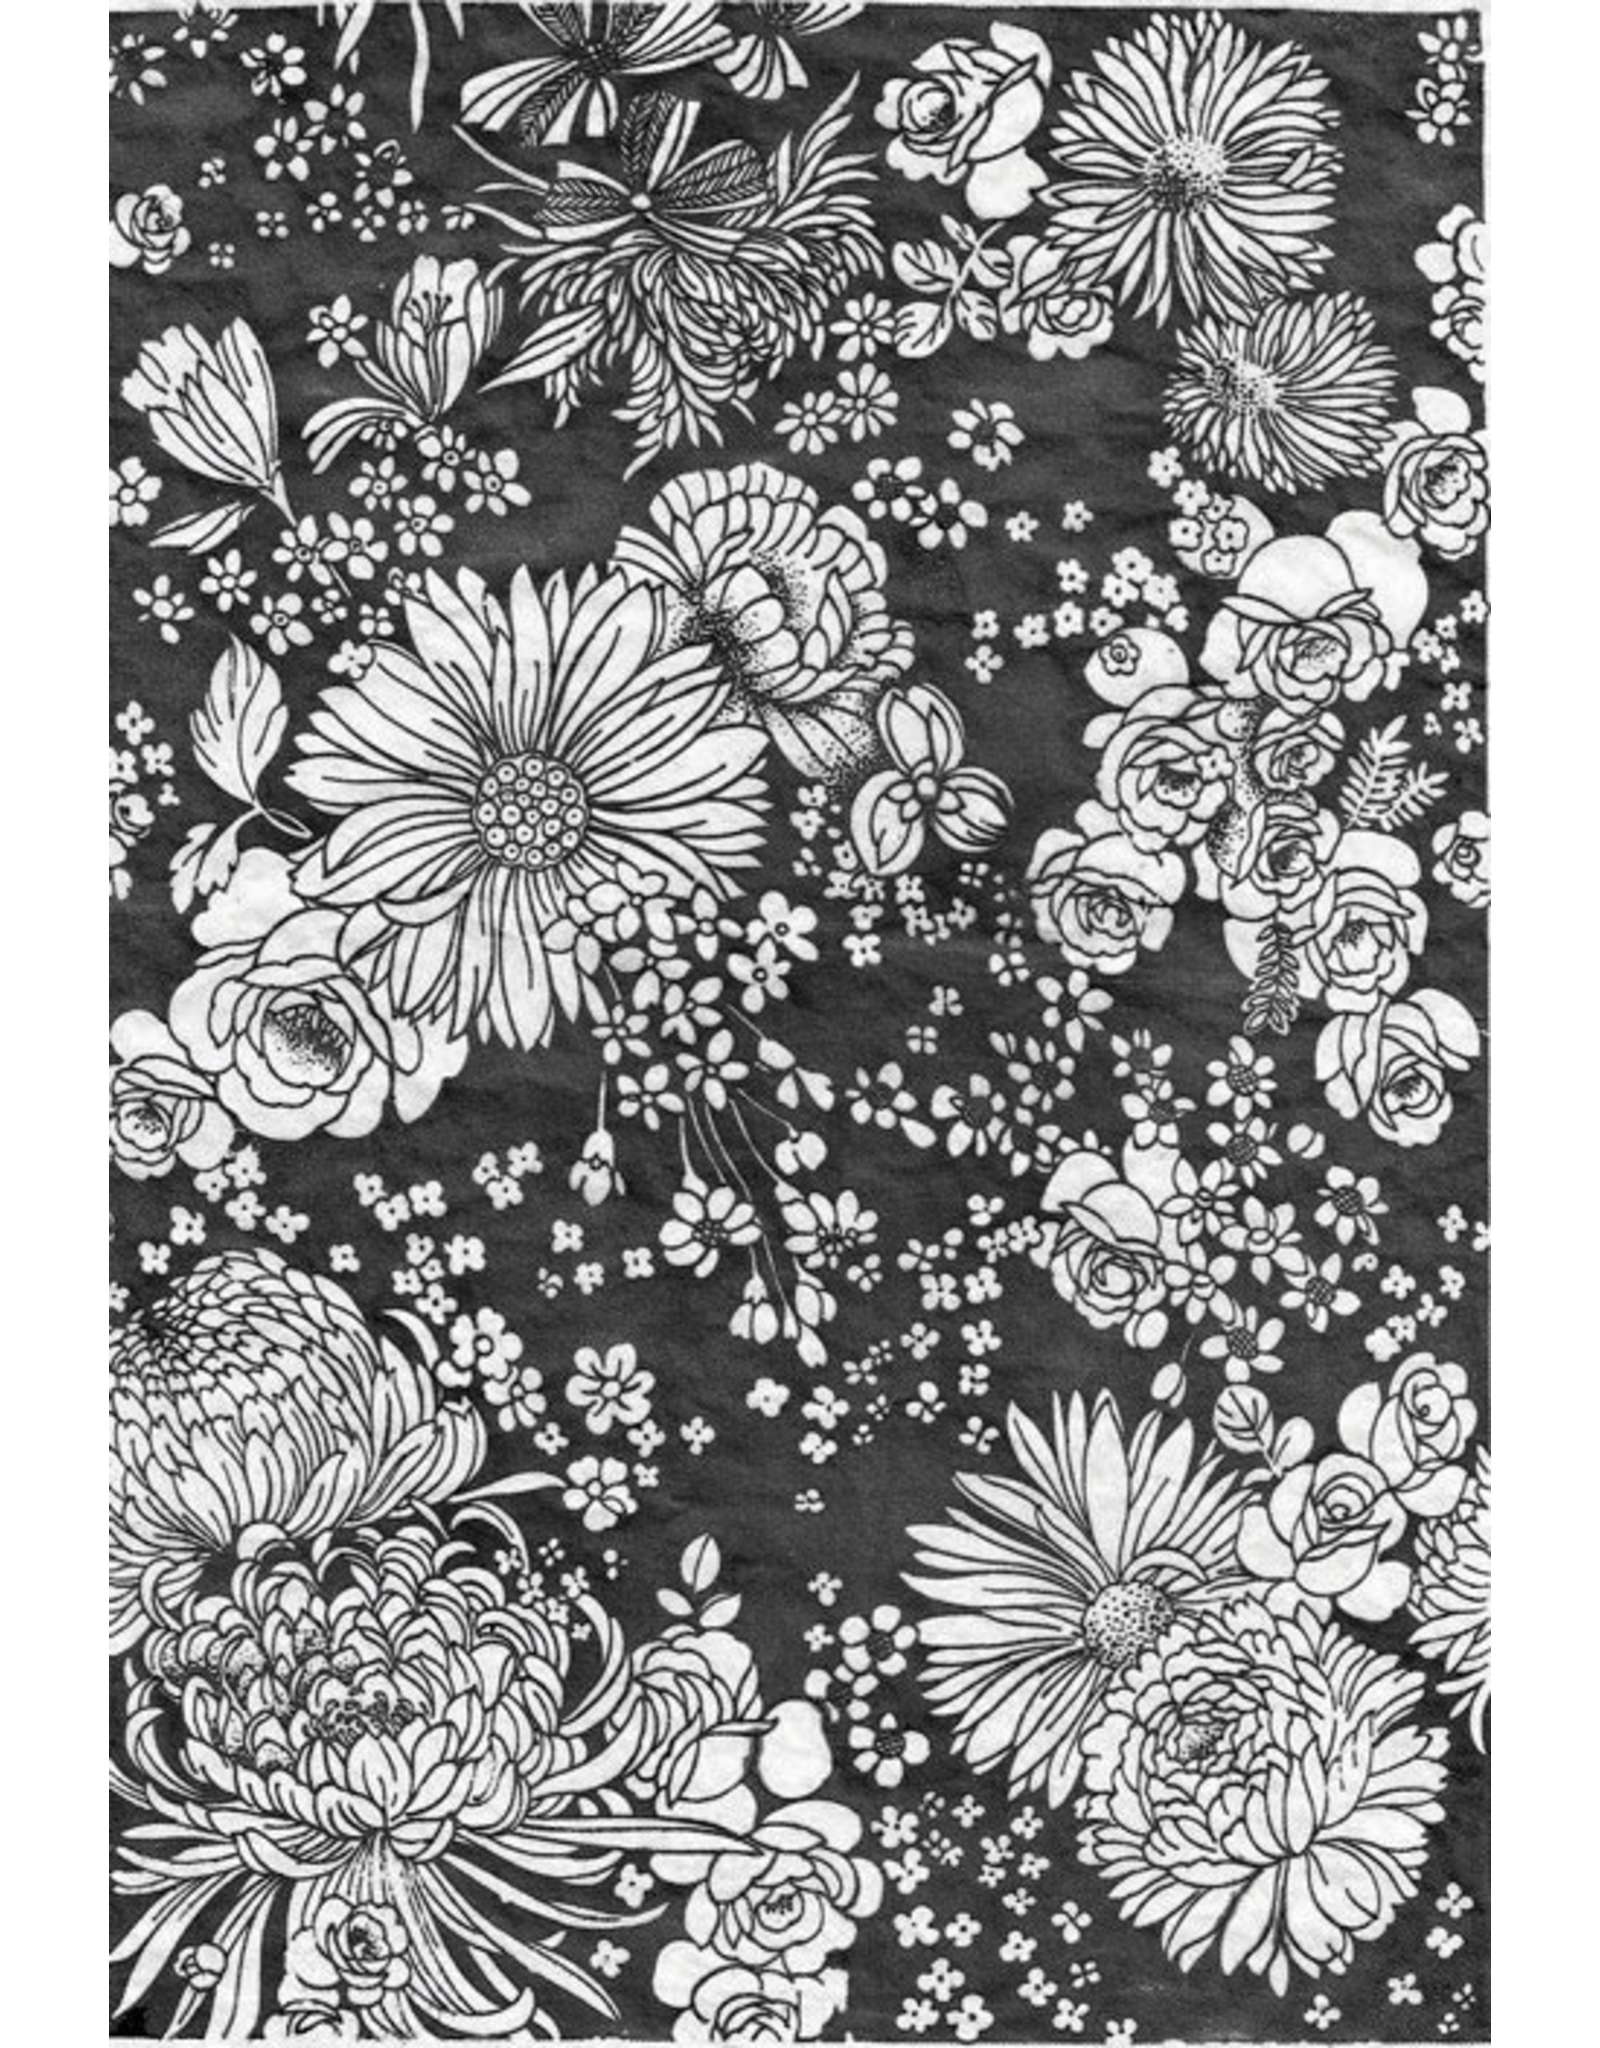 Sanbao Flower decal 01